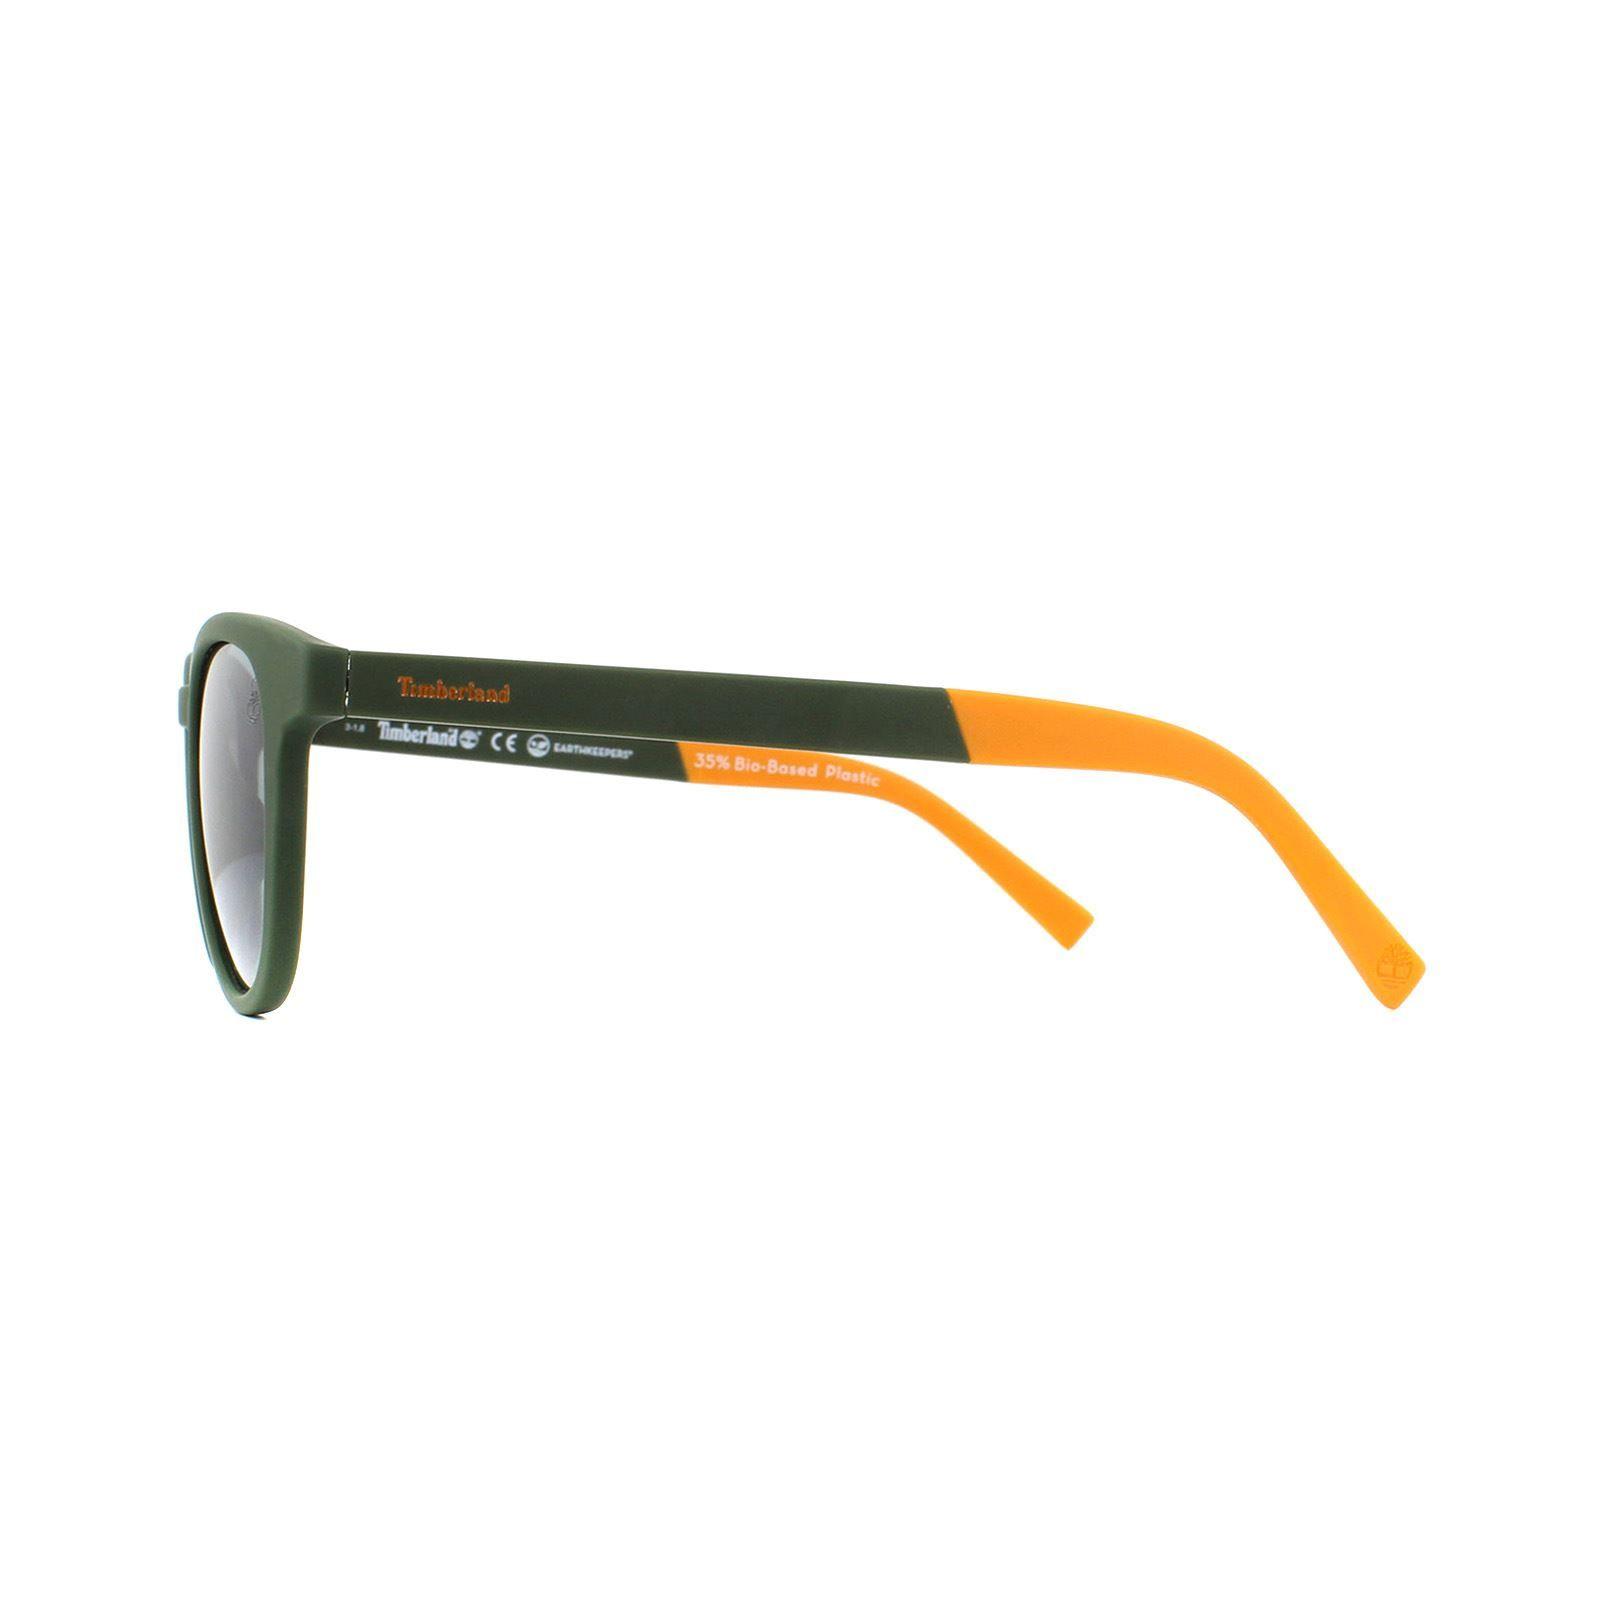 Timberland Sunglasses TB9128 97D Dark Green Grey Polarized